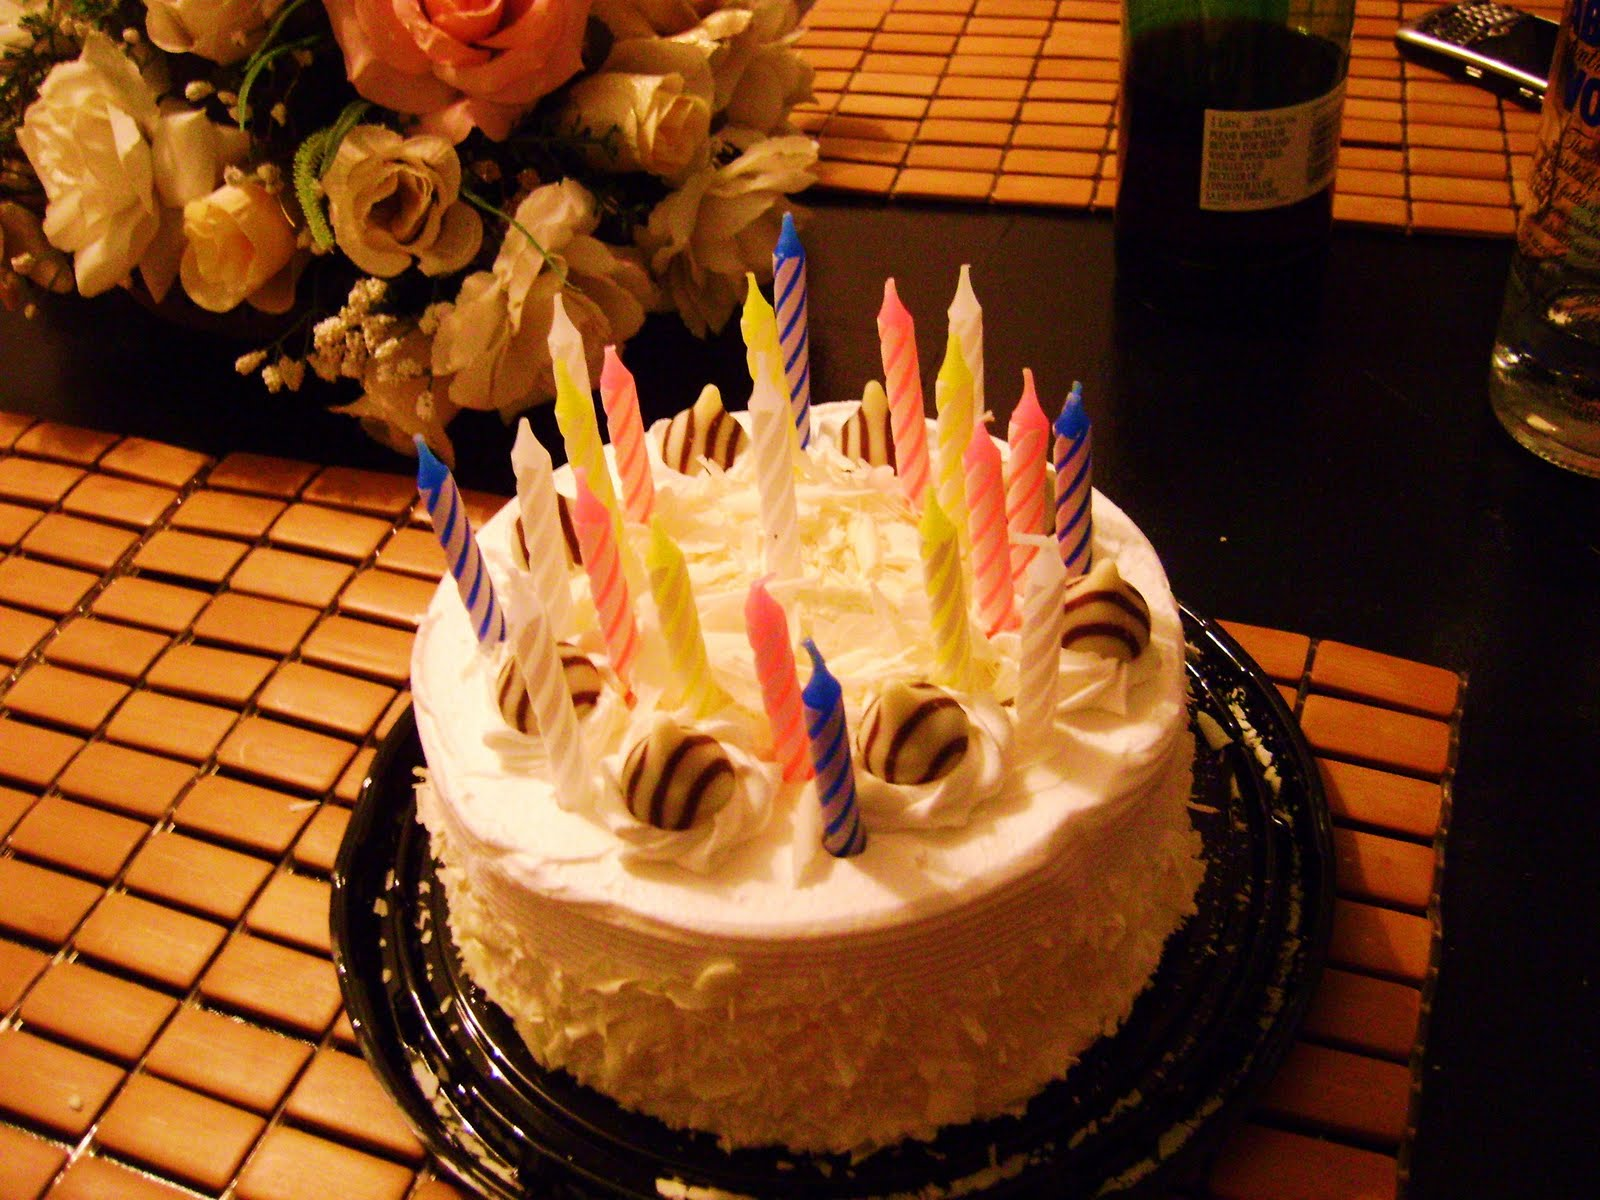 Sobeys Cake Designs